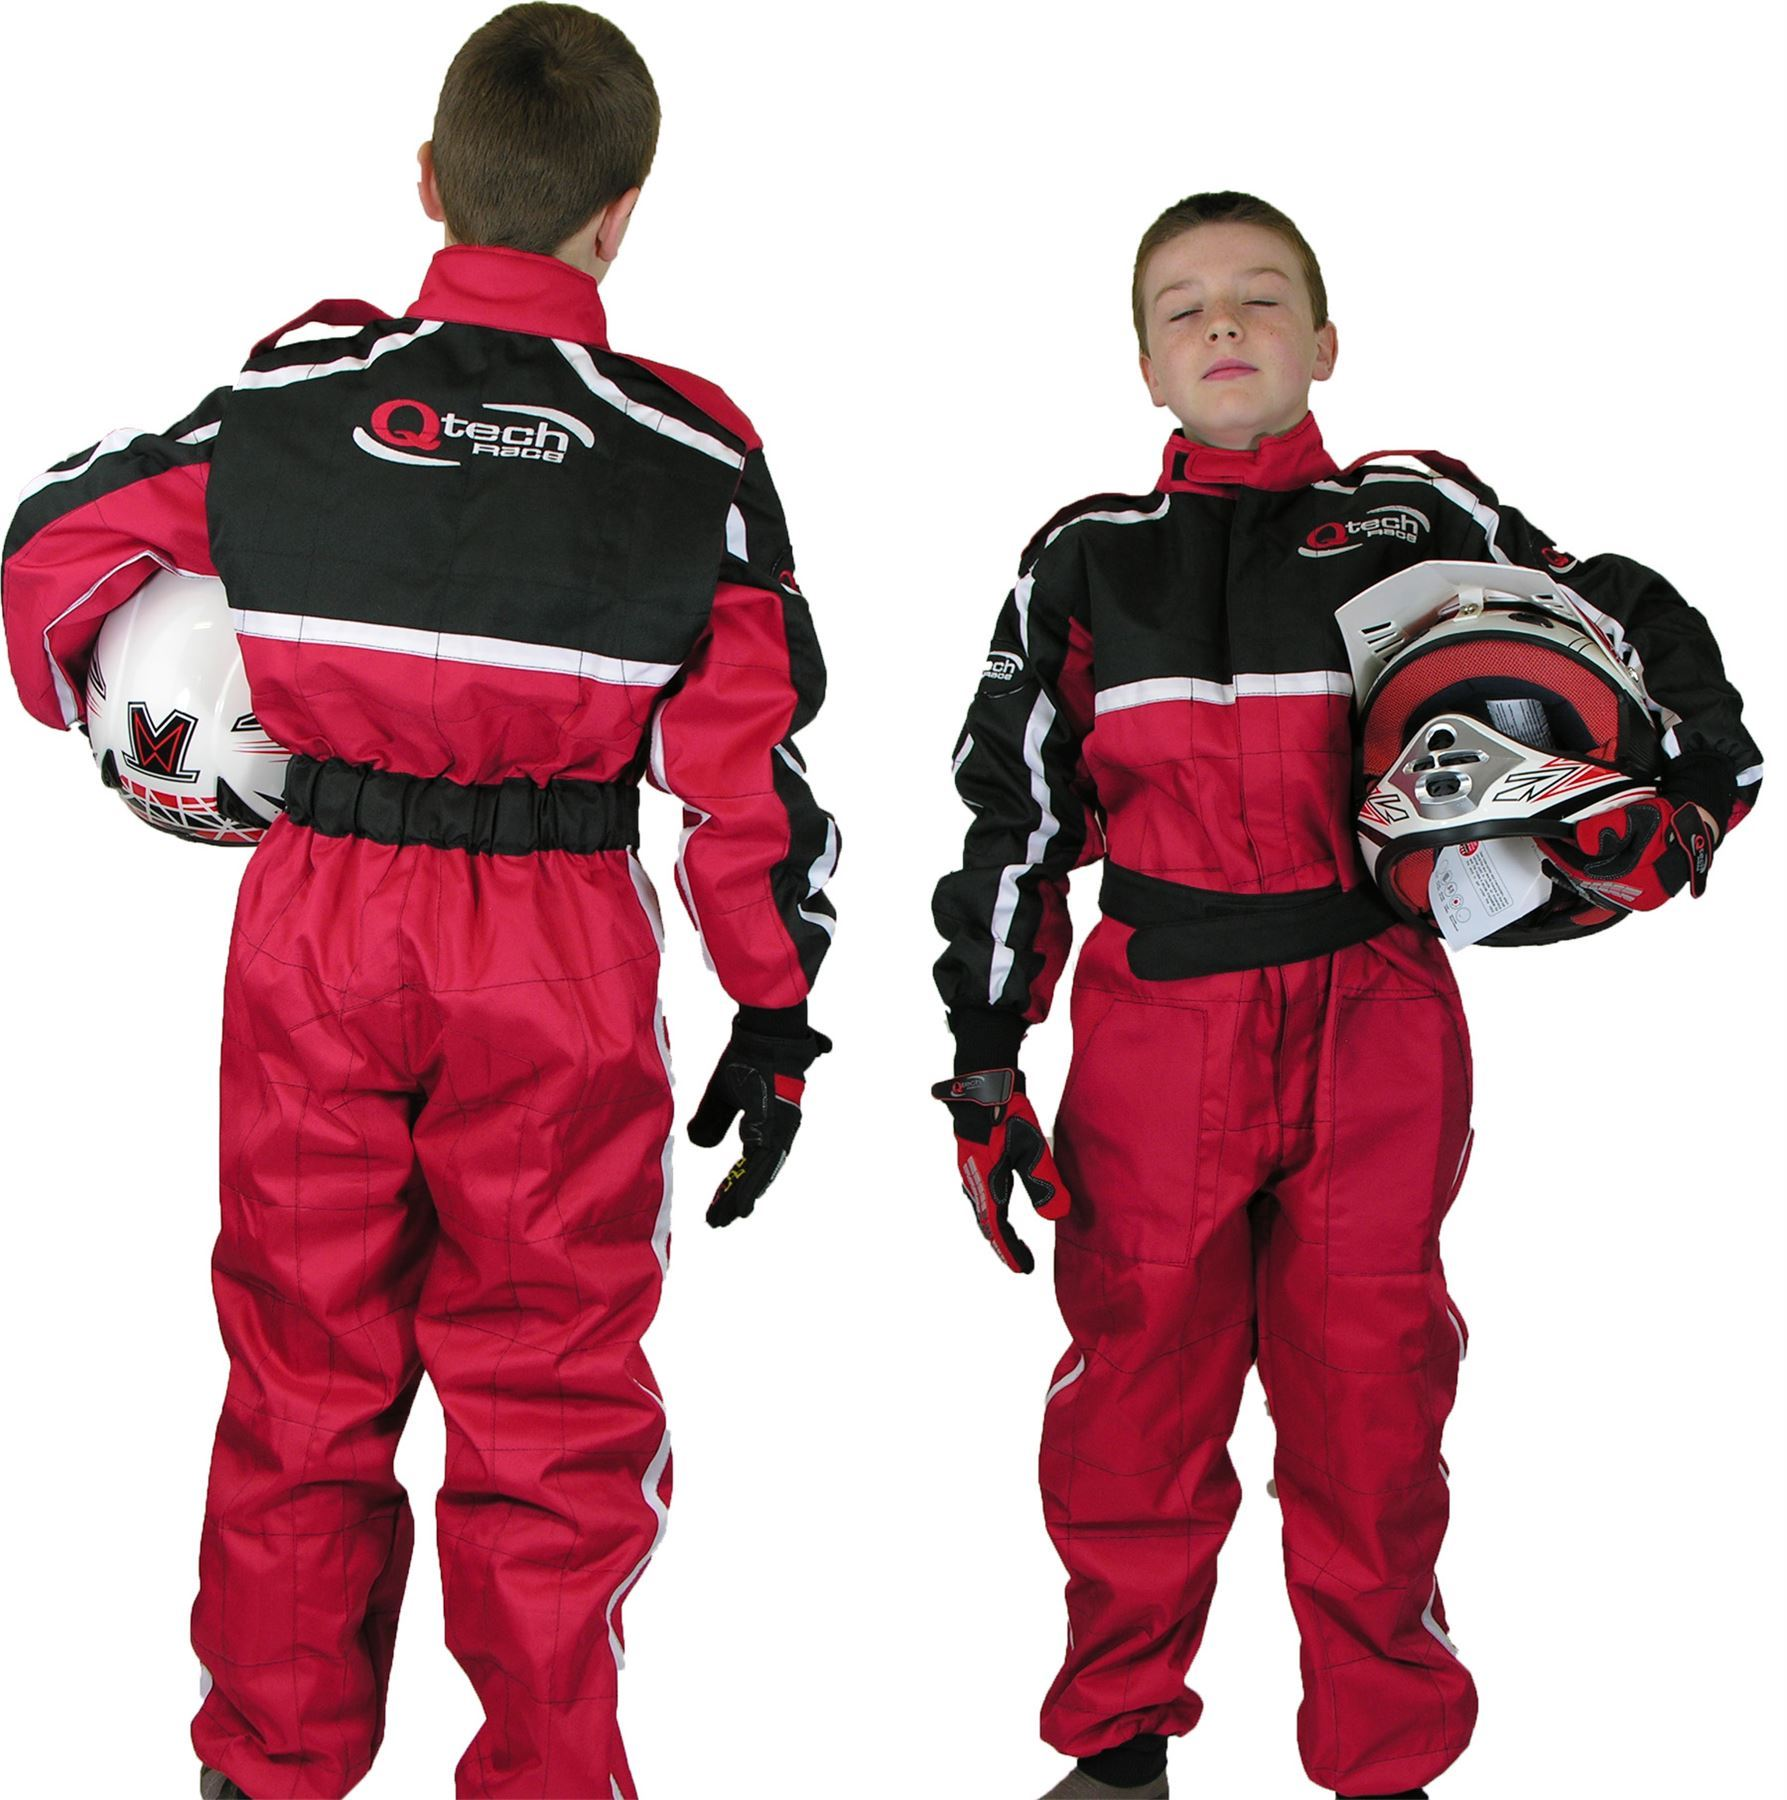 Cheap Motocross Clothing Uk